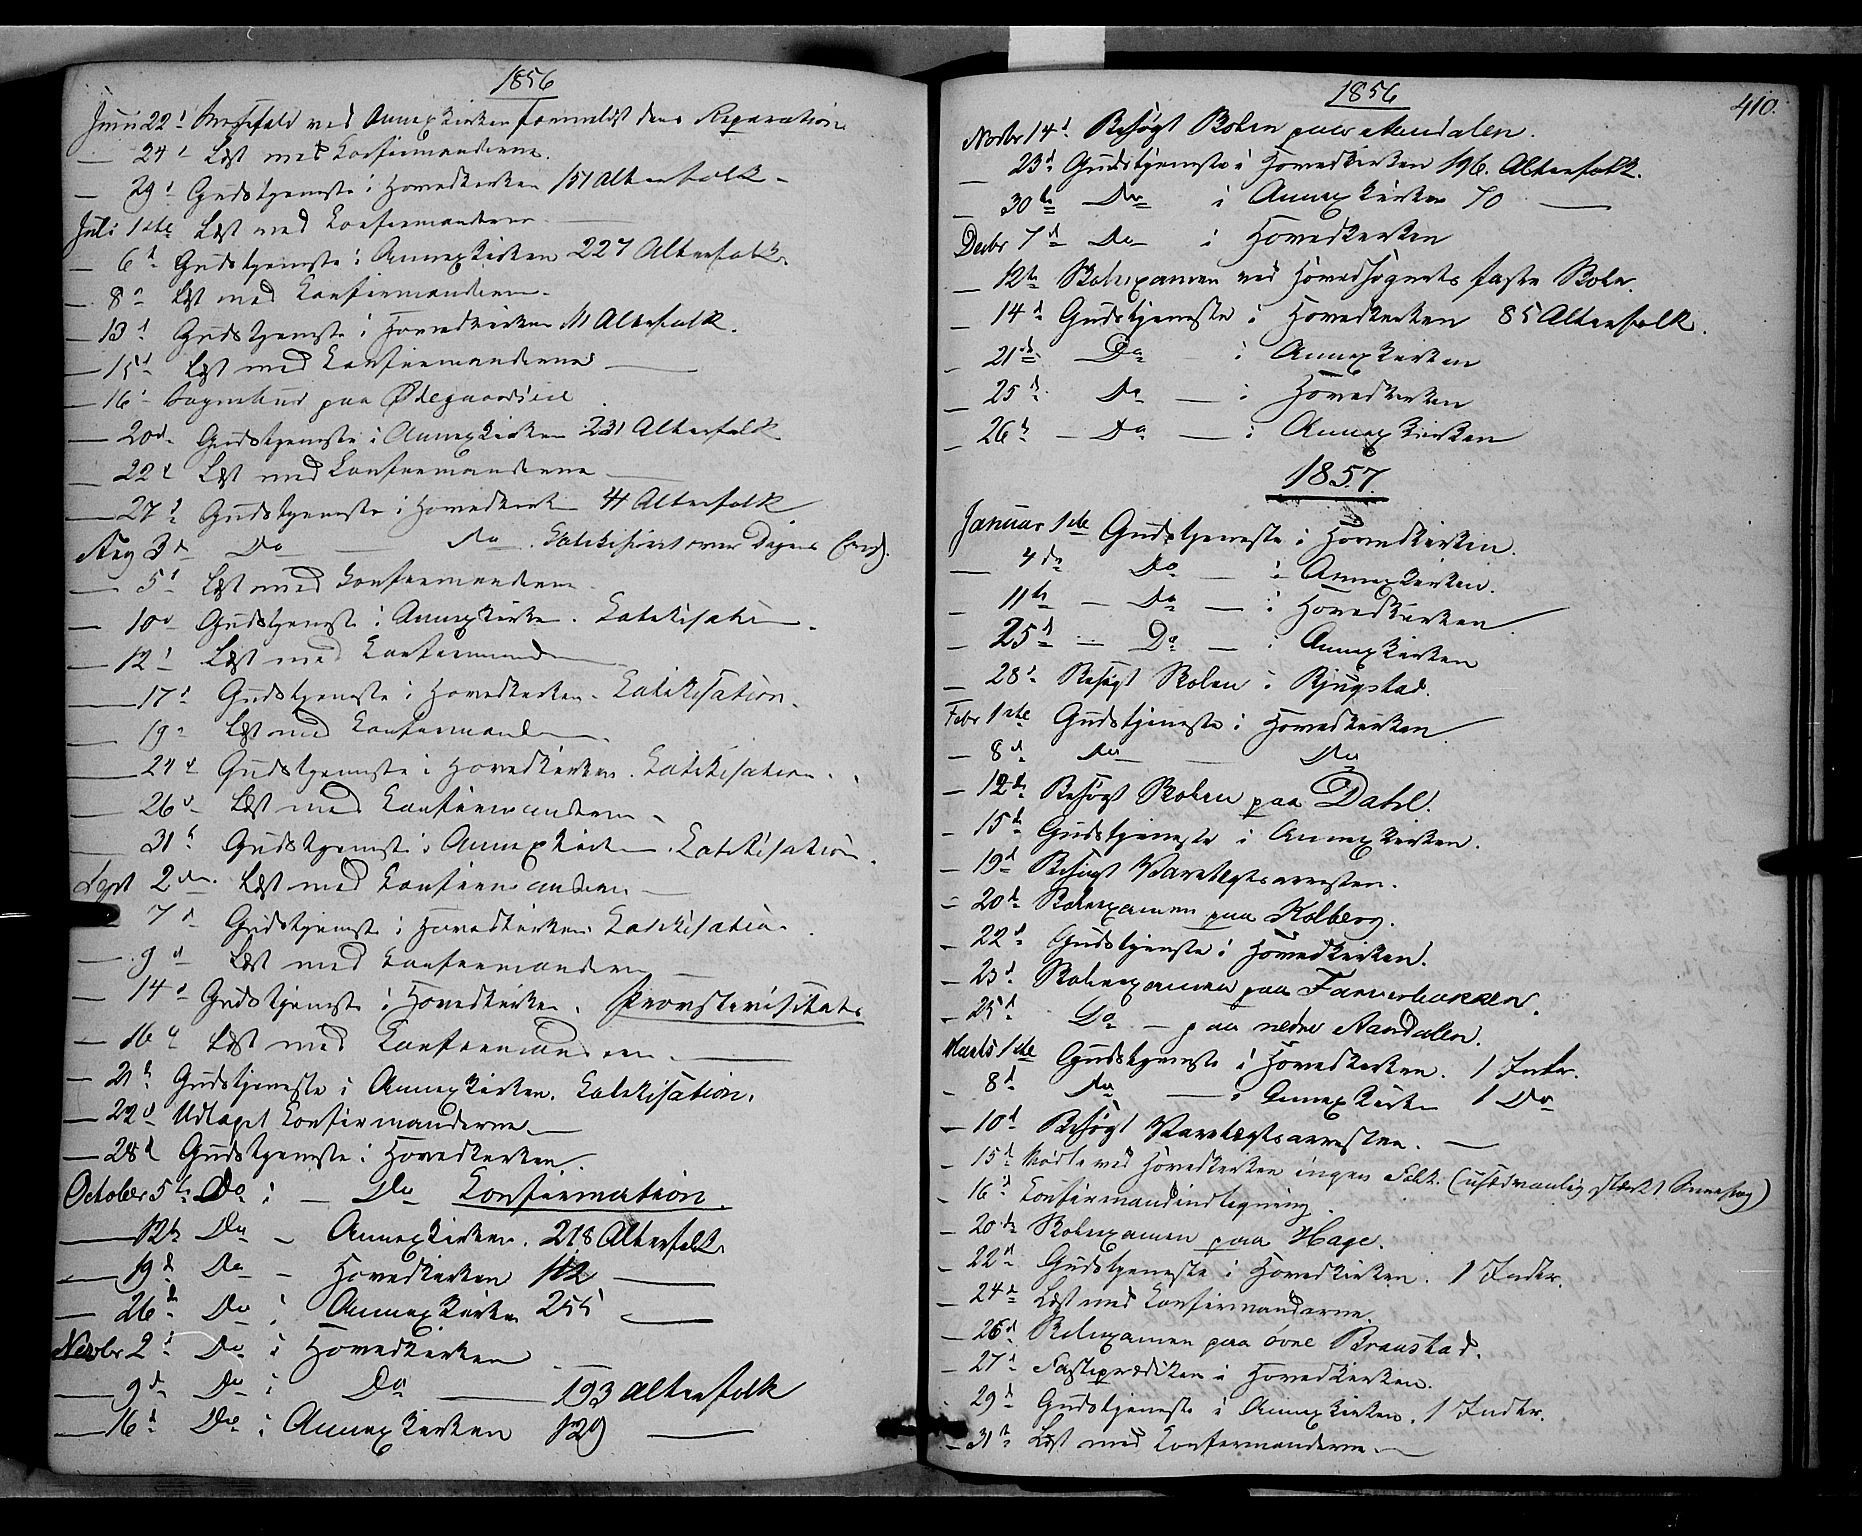 SAH, Vardal prestekontor, H/Ha/Haa/L0006: Ministerialbok nr. 6, 1854-1866, s. 410